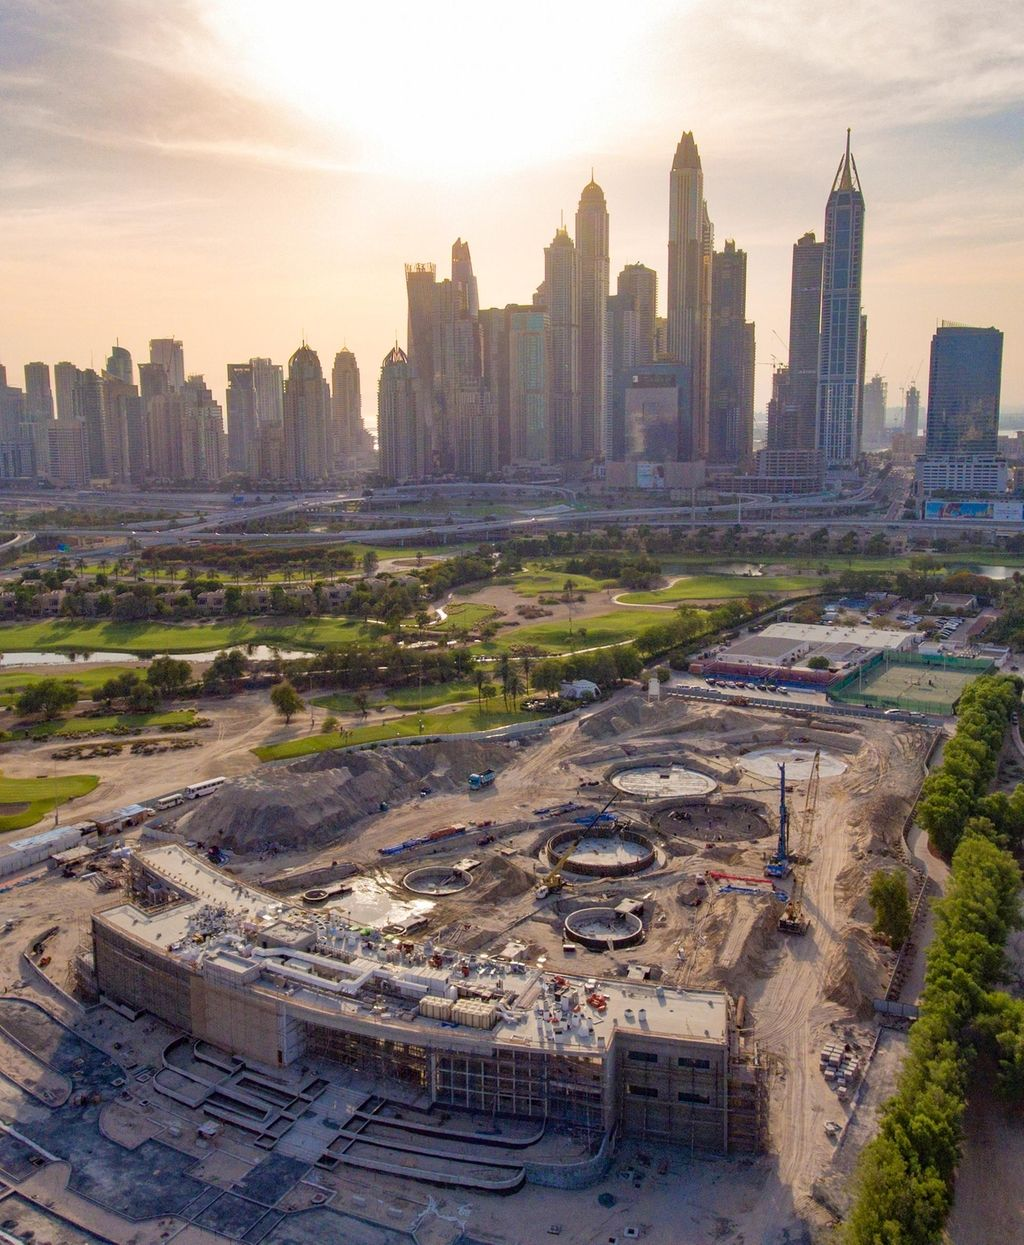 Topgolf Dubai: new entertainment destination to open at Emirates Golf Club